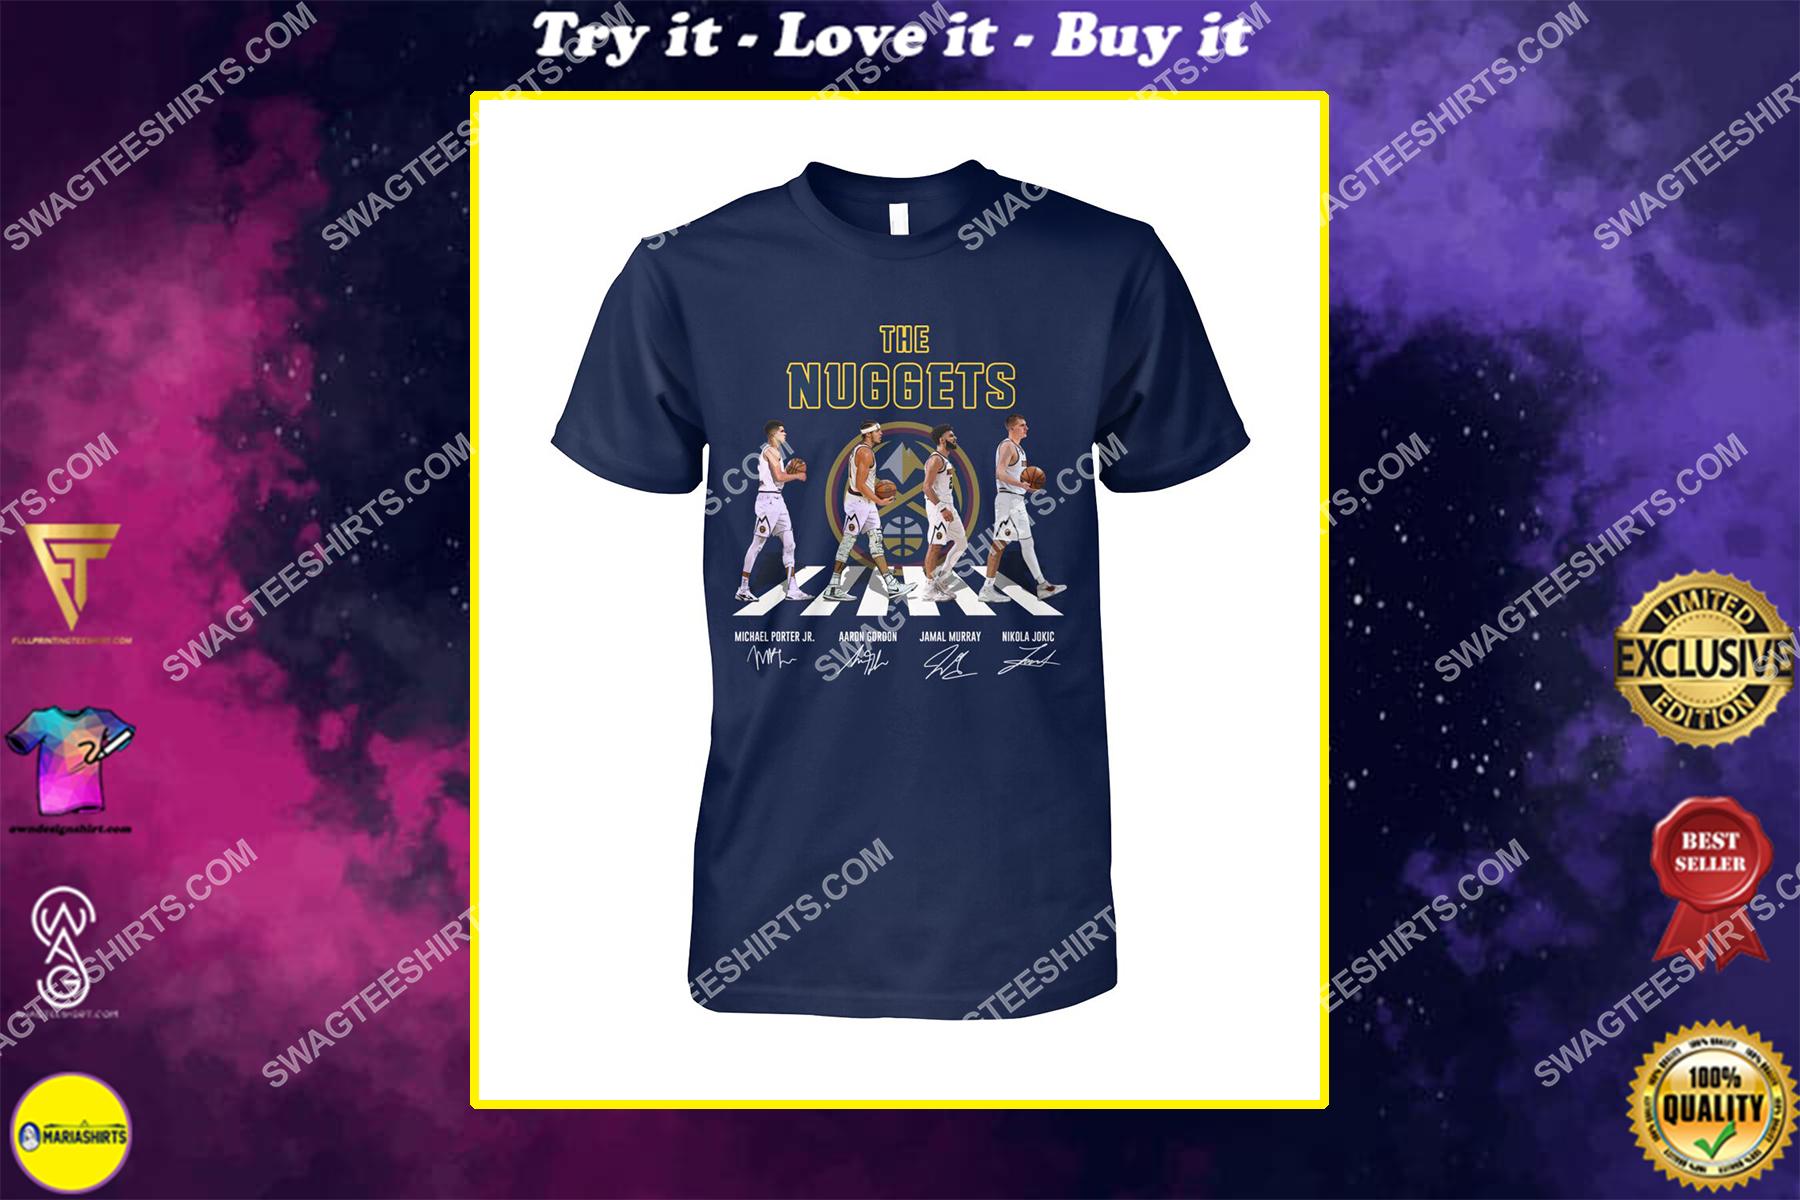 the denver nuggets walking abbey road shirt